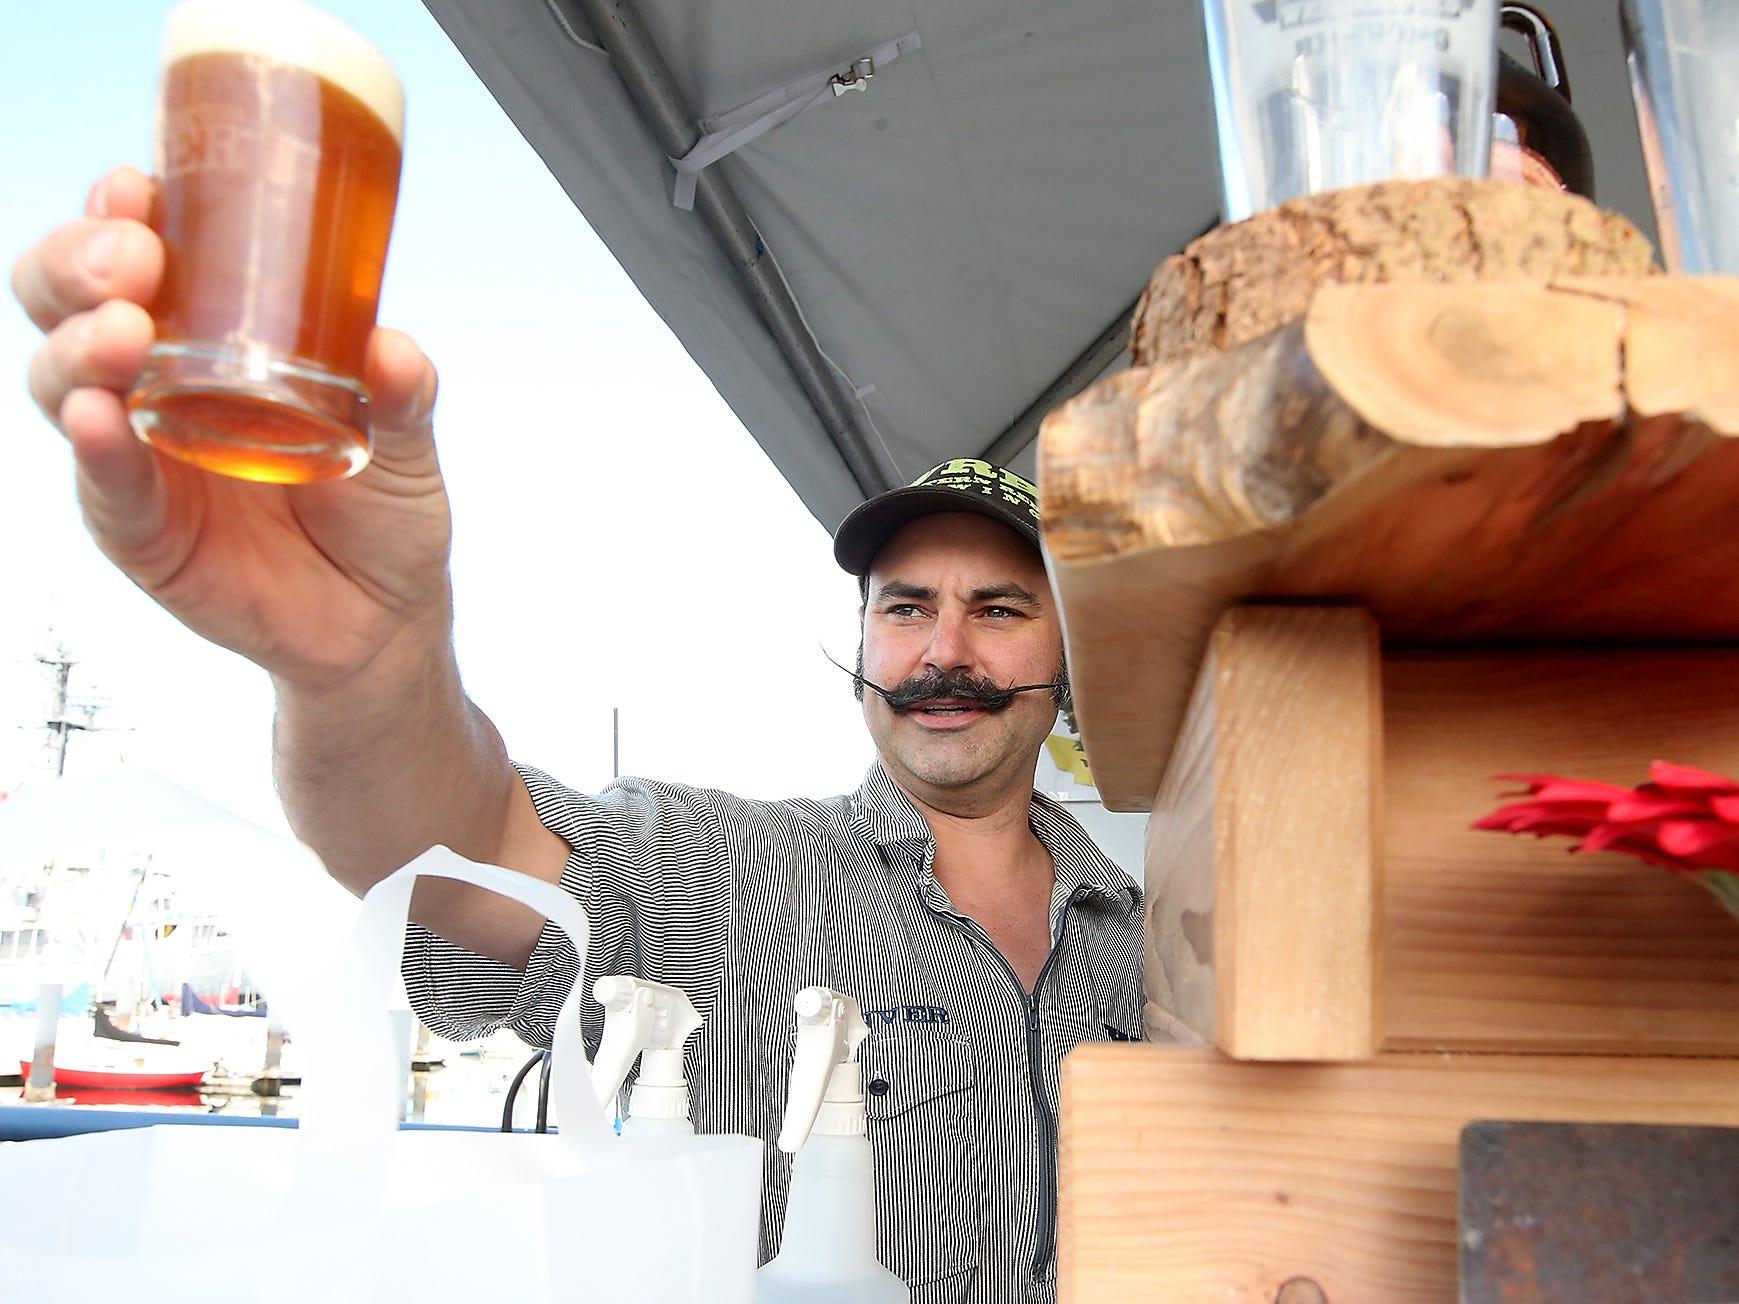 Western Red Brewing's Denver Smyth serves up a beer during the Bremerton Summer Brewfest on the Bremerton Boardwalk on Friday, July 20, 2018.